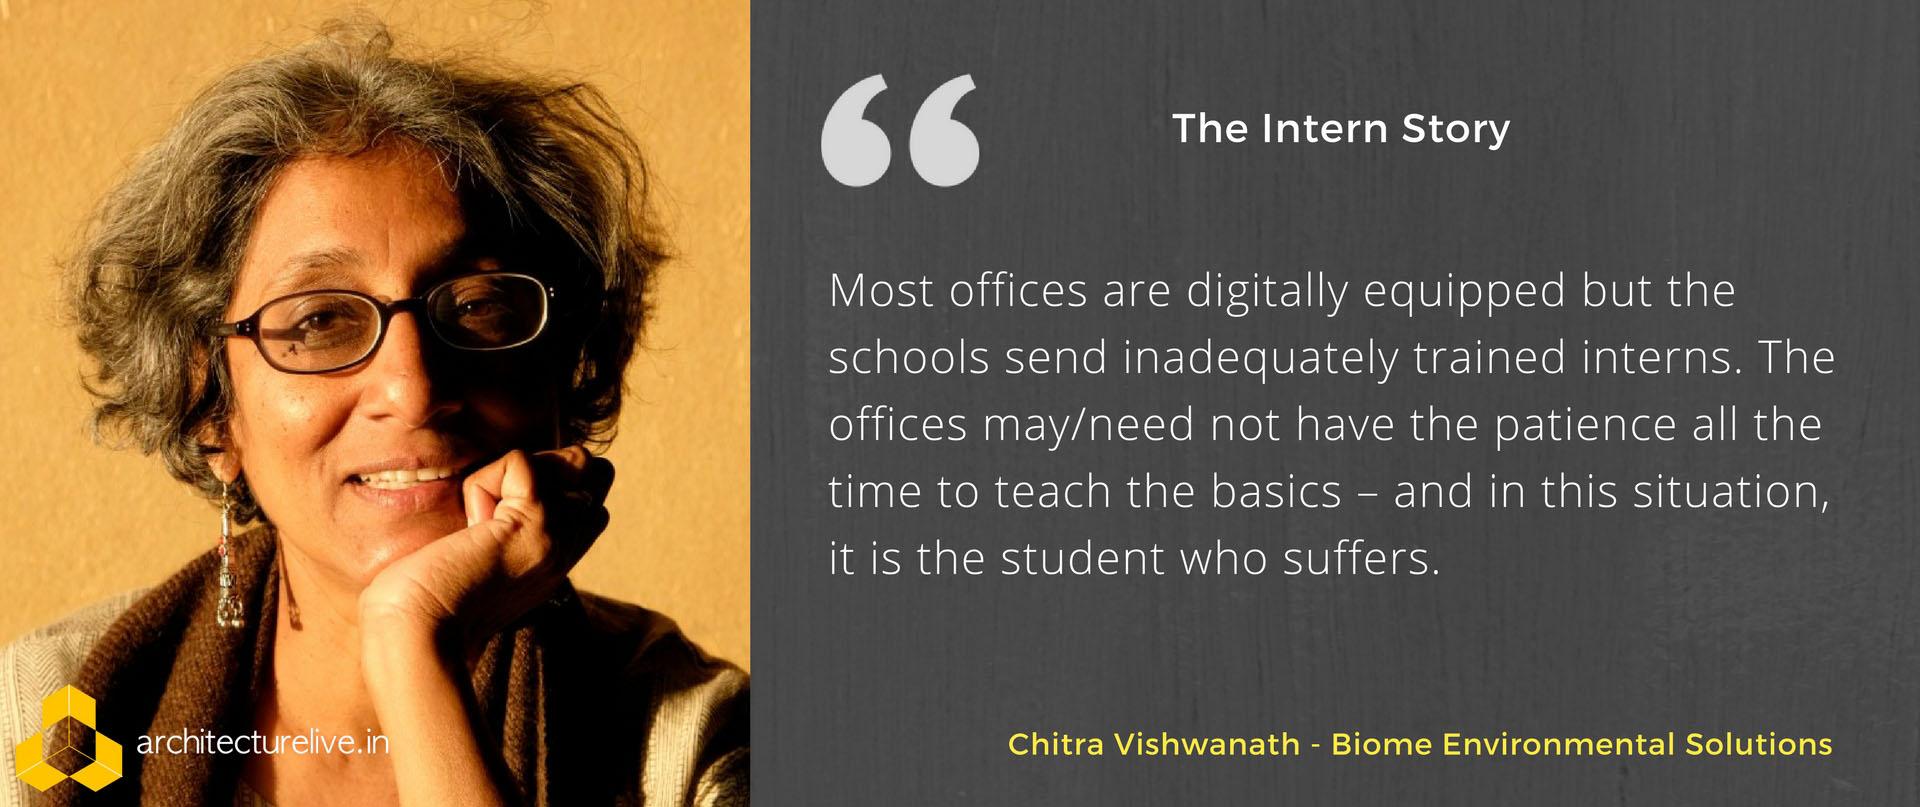 Chitra Vishwanath on Architectural Internships